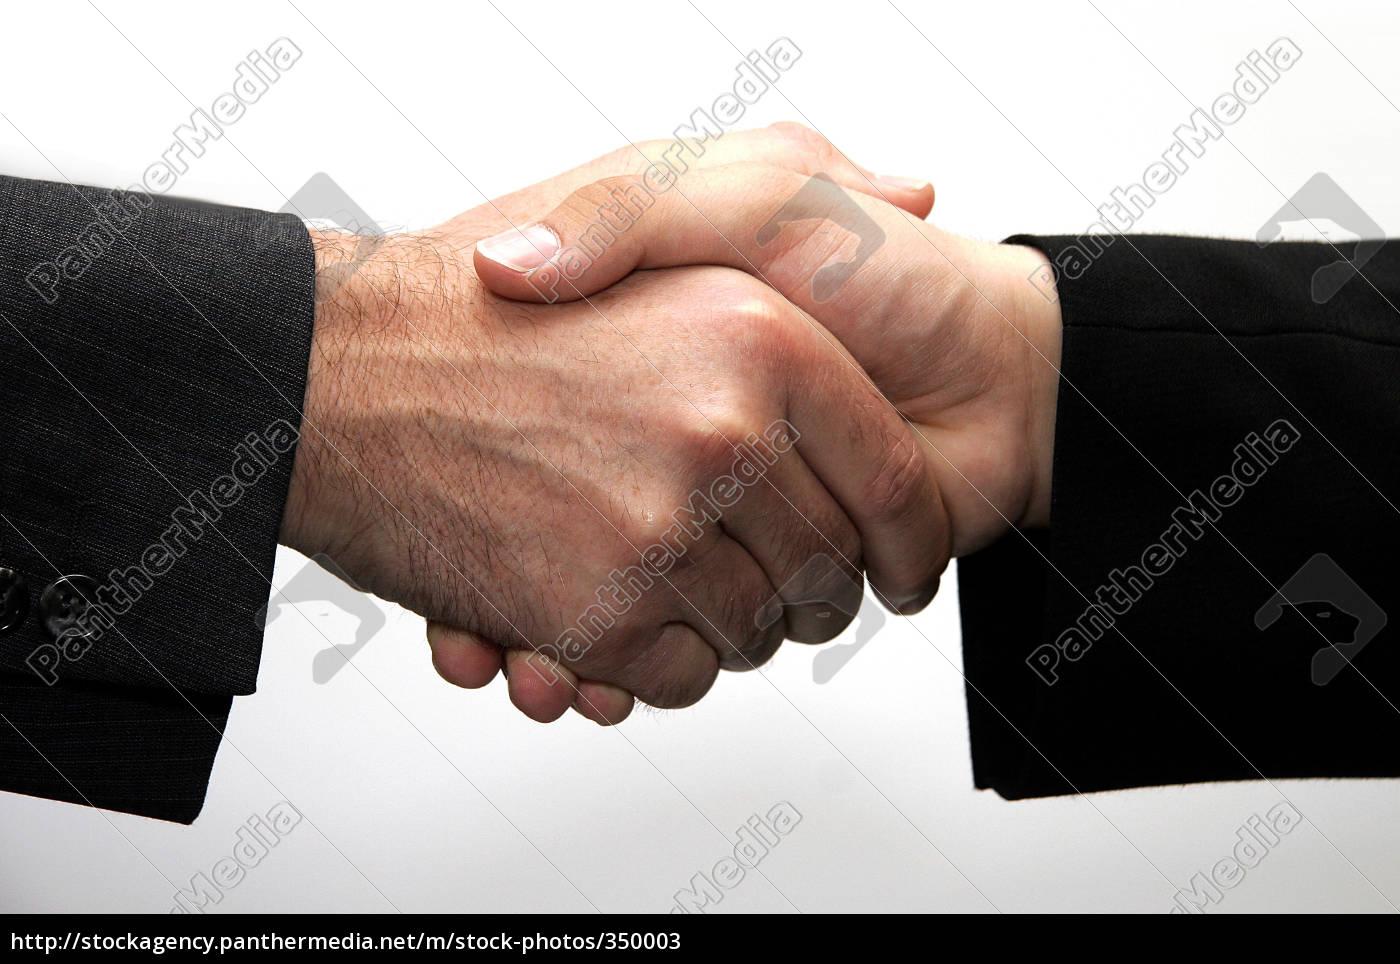 strong, handshake - 350003